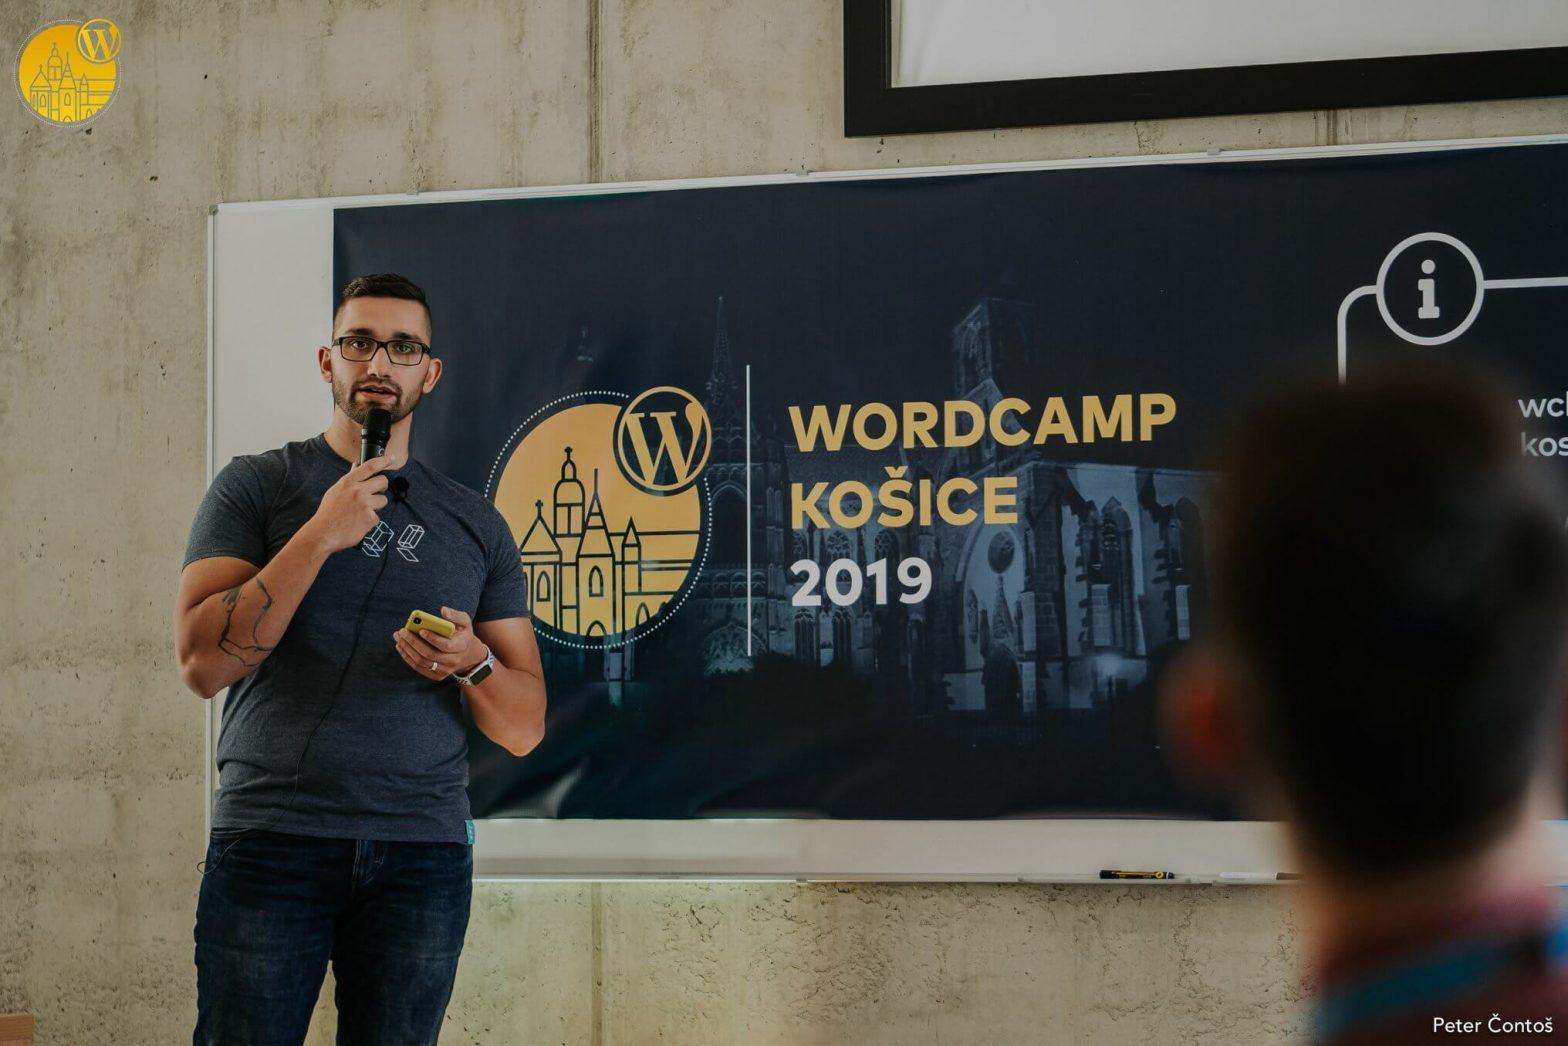 Karol Vörös @ WordCamp Košice 2019